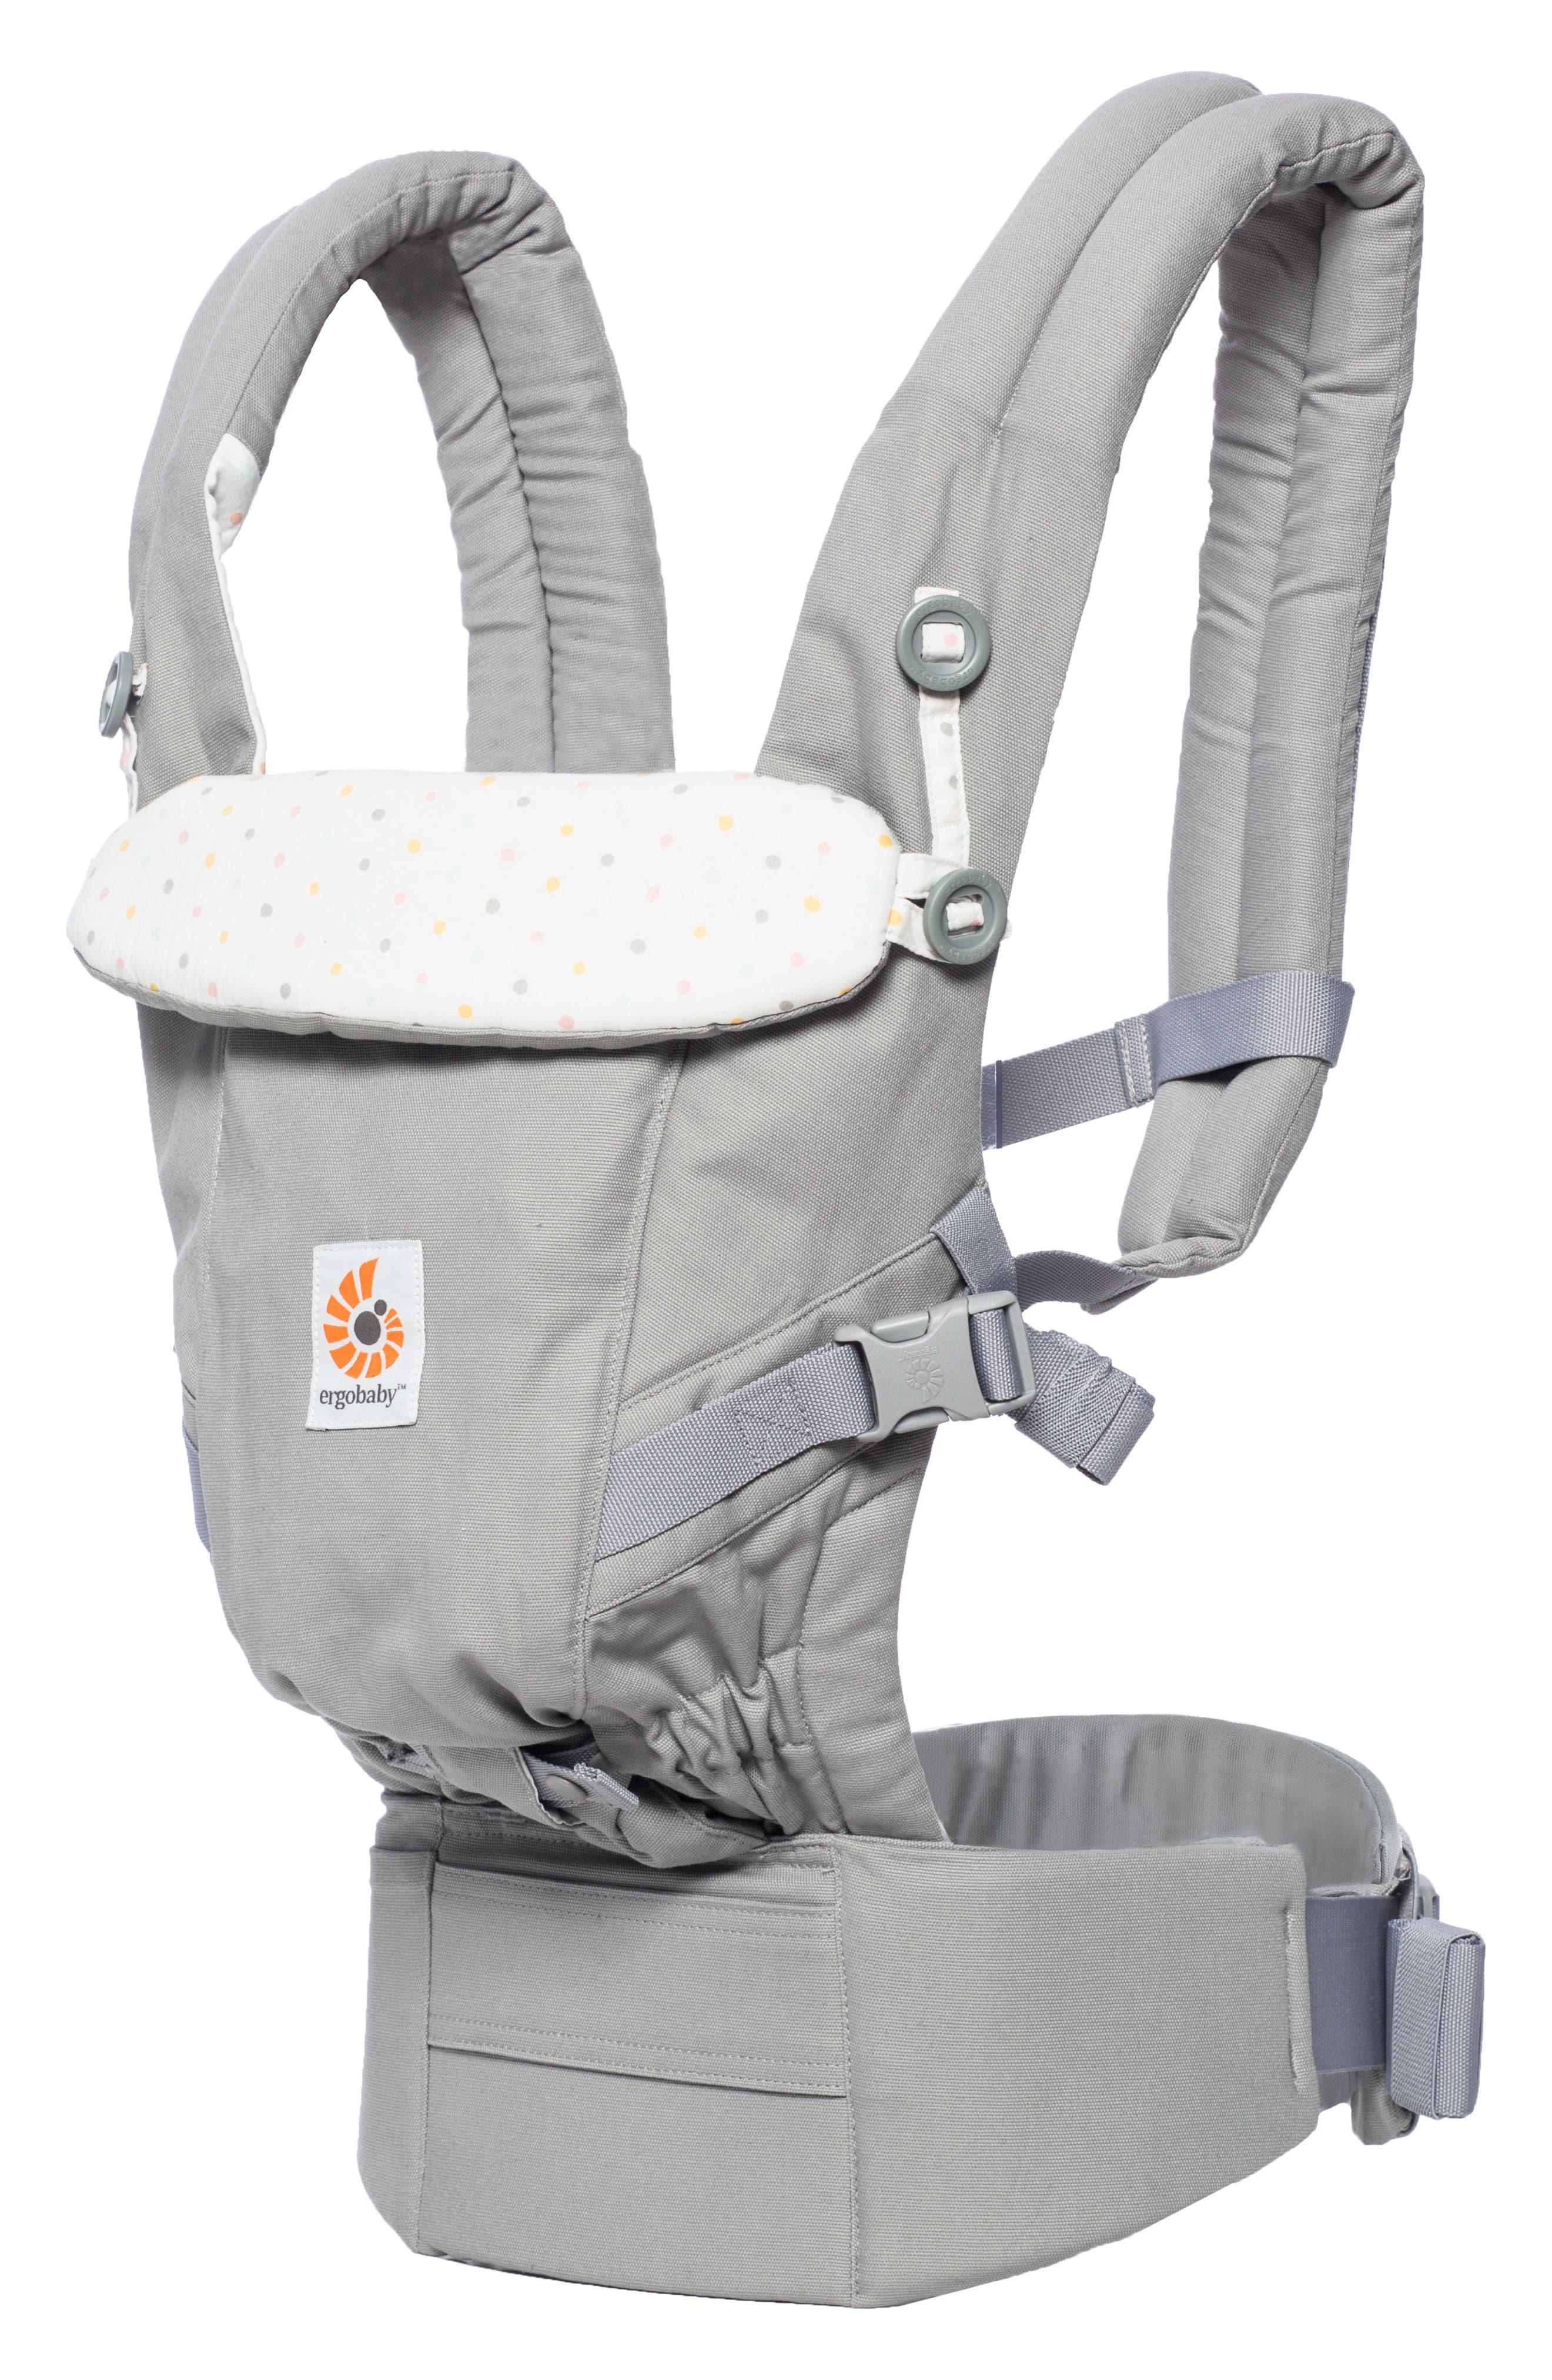 Alternate Image 2  - ERGObaby Three Position ADAPT Baby Carrier